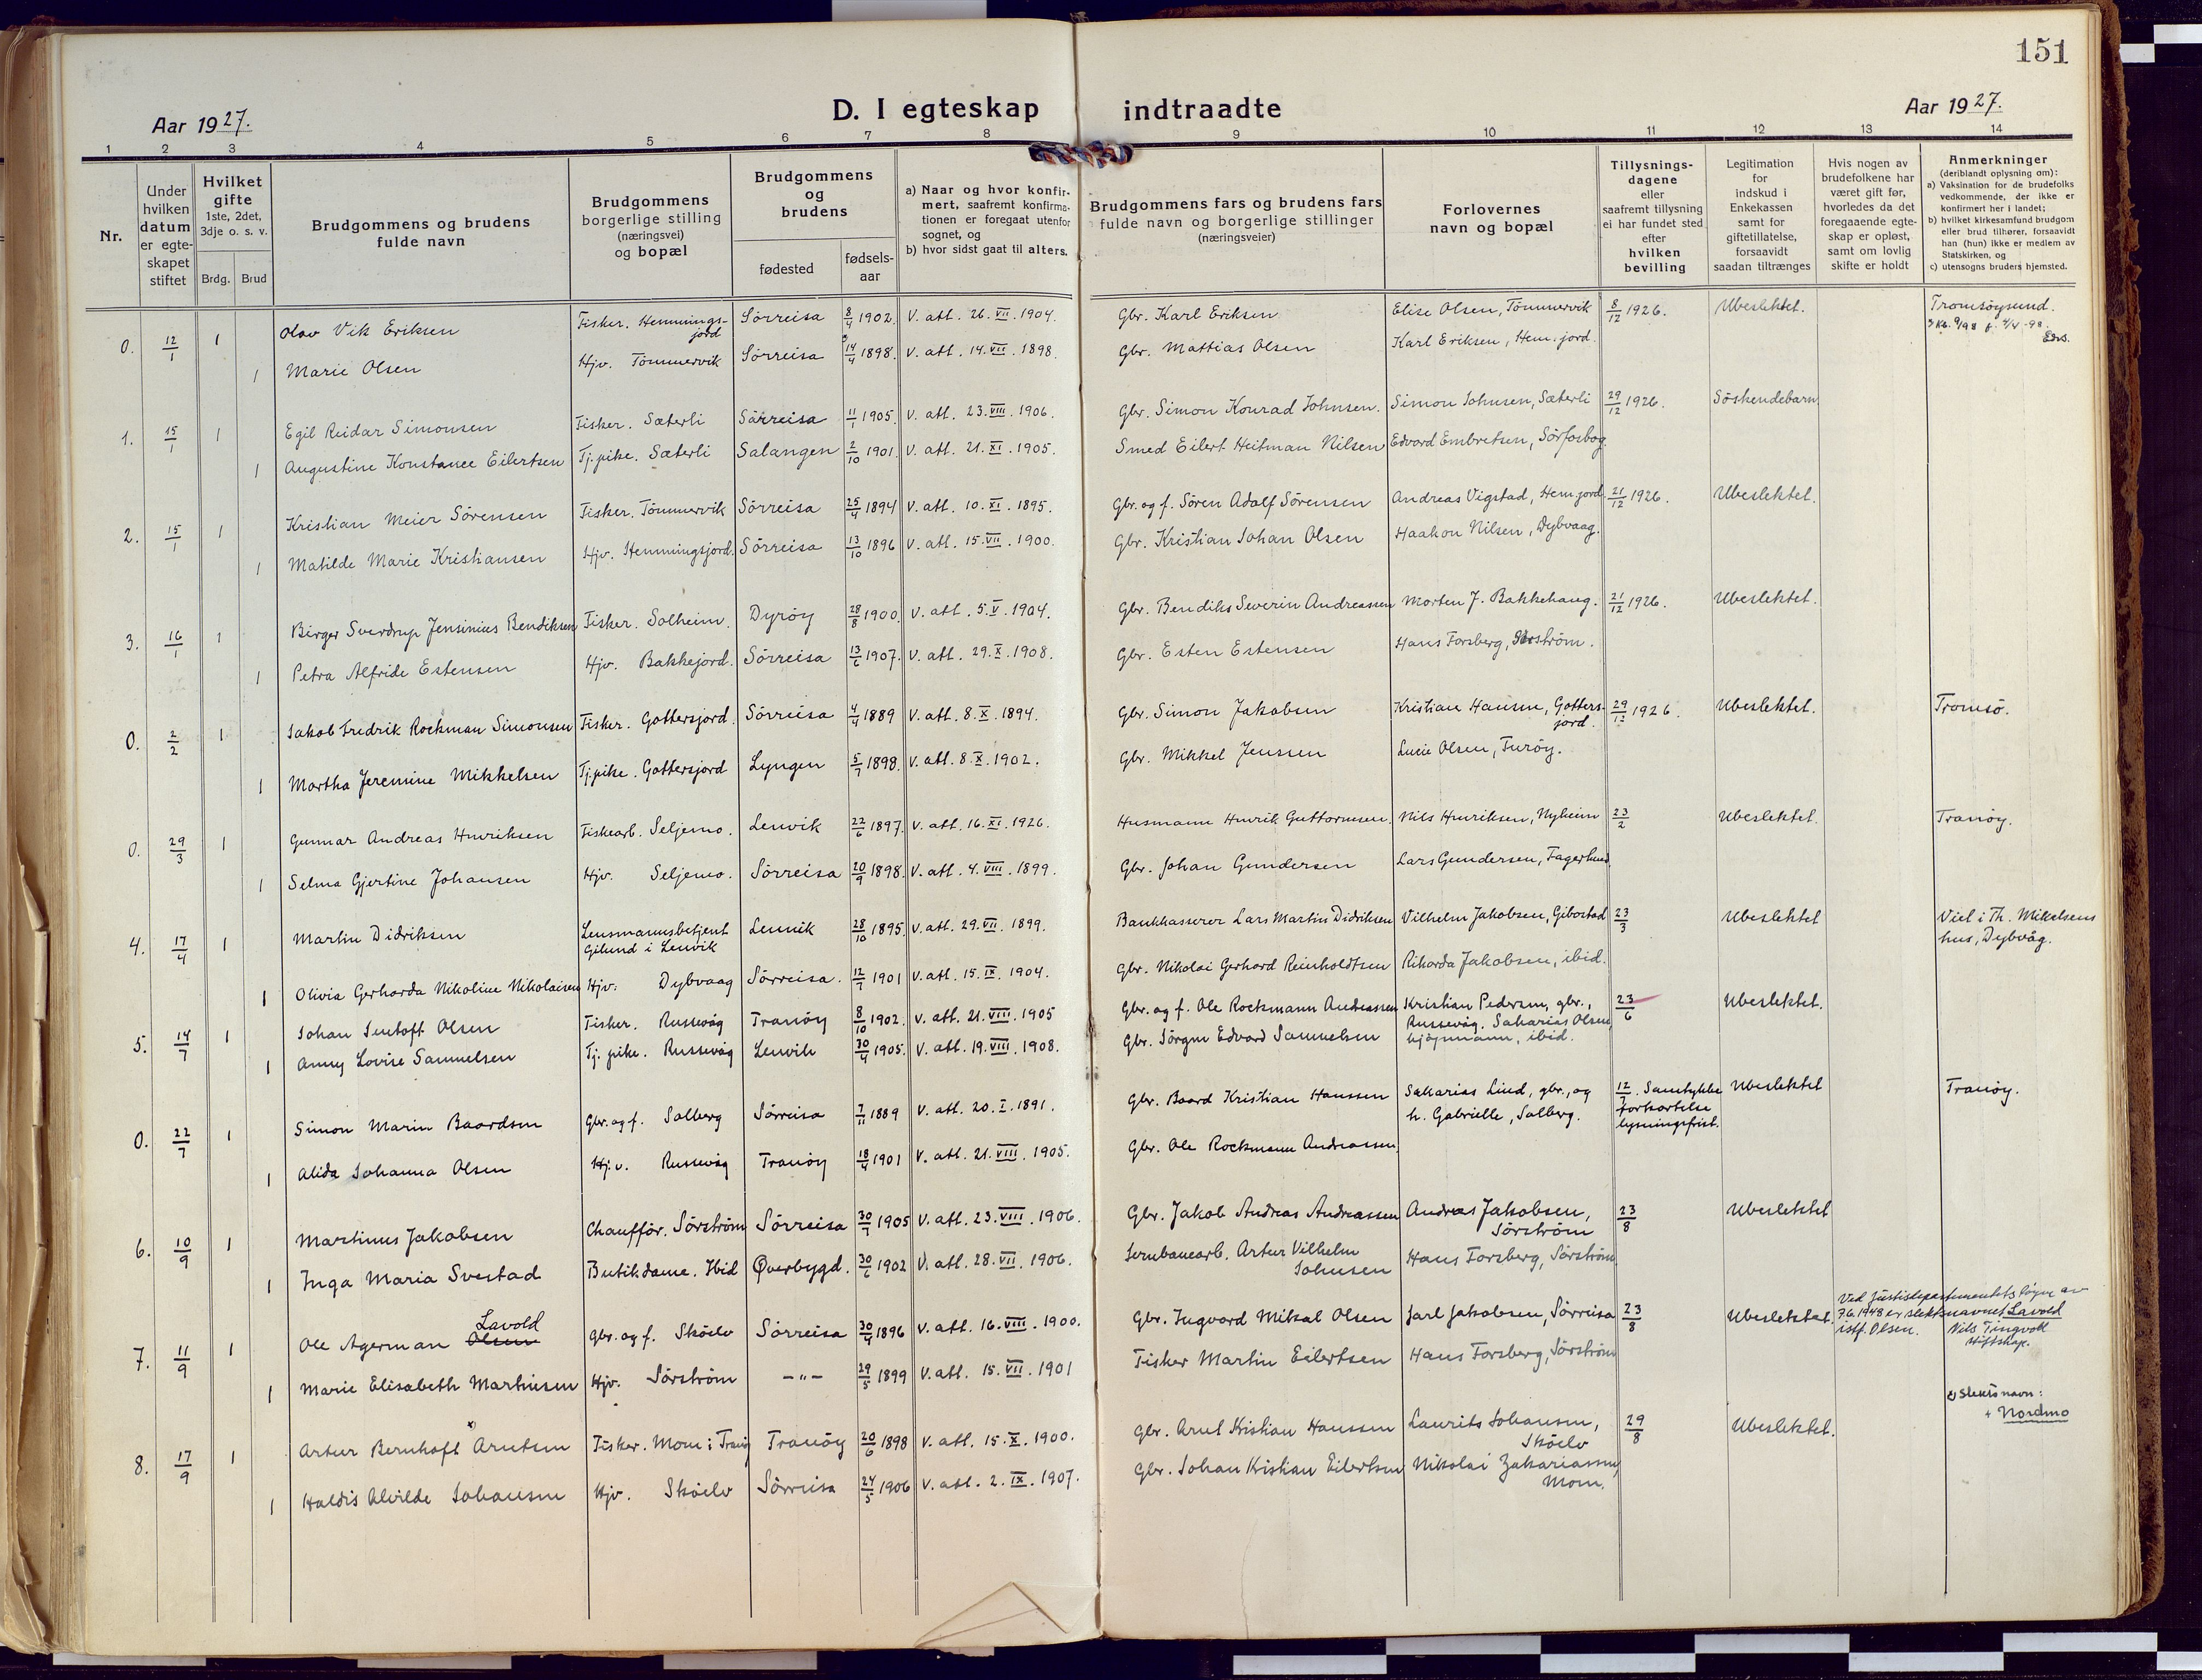 SATØ, Tranøy sokneprestkontor, I/Ia/Iaa/L0015kirke: Ministerialbok nr. 15, 1919-1928, s. 151